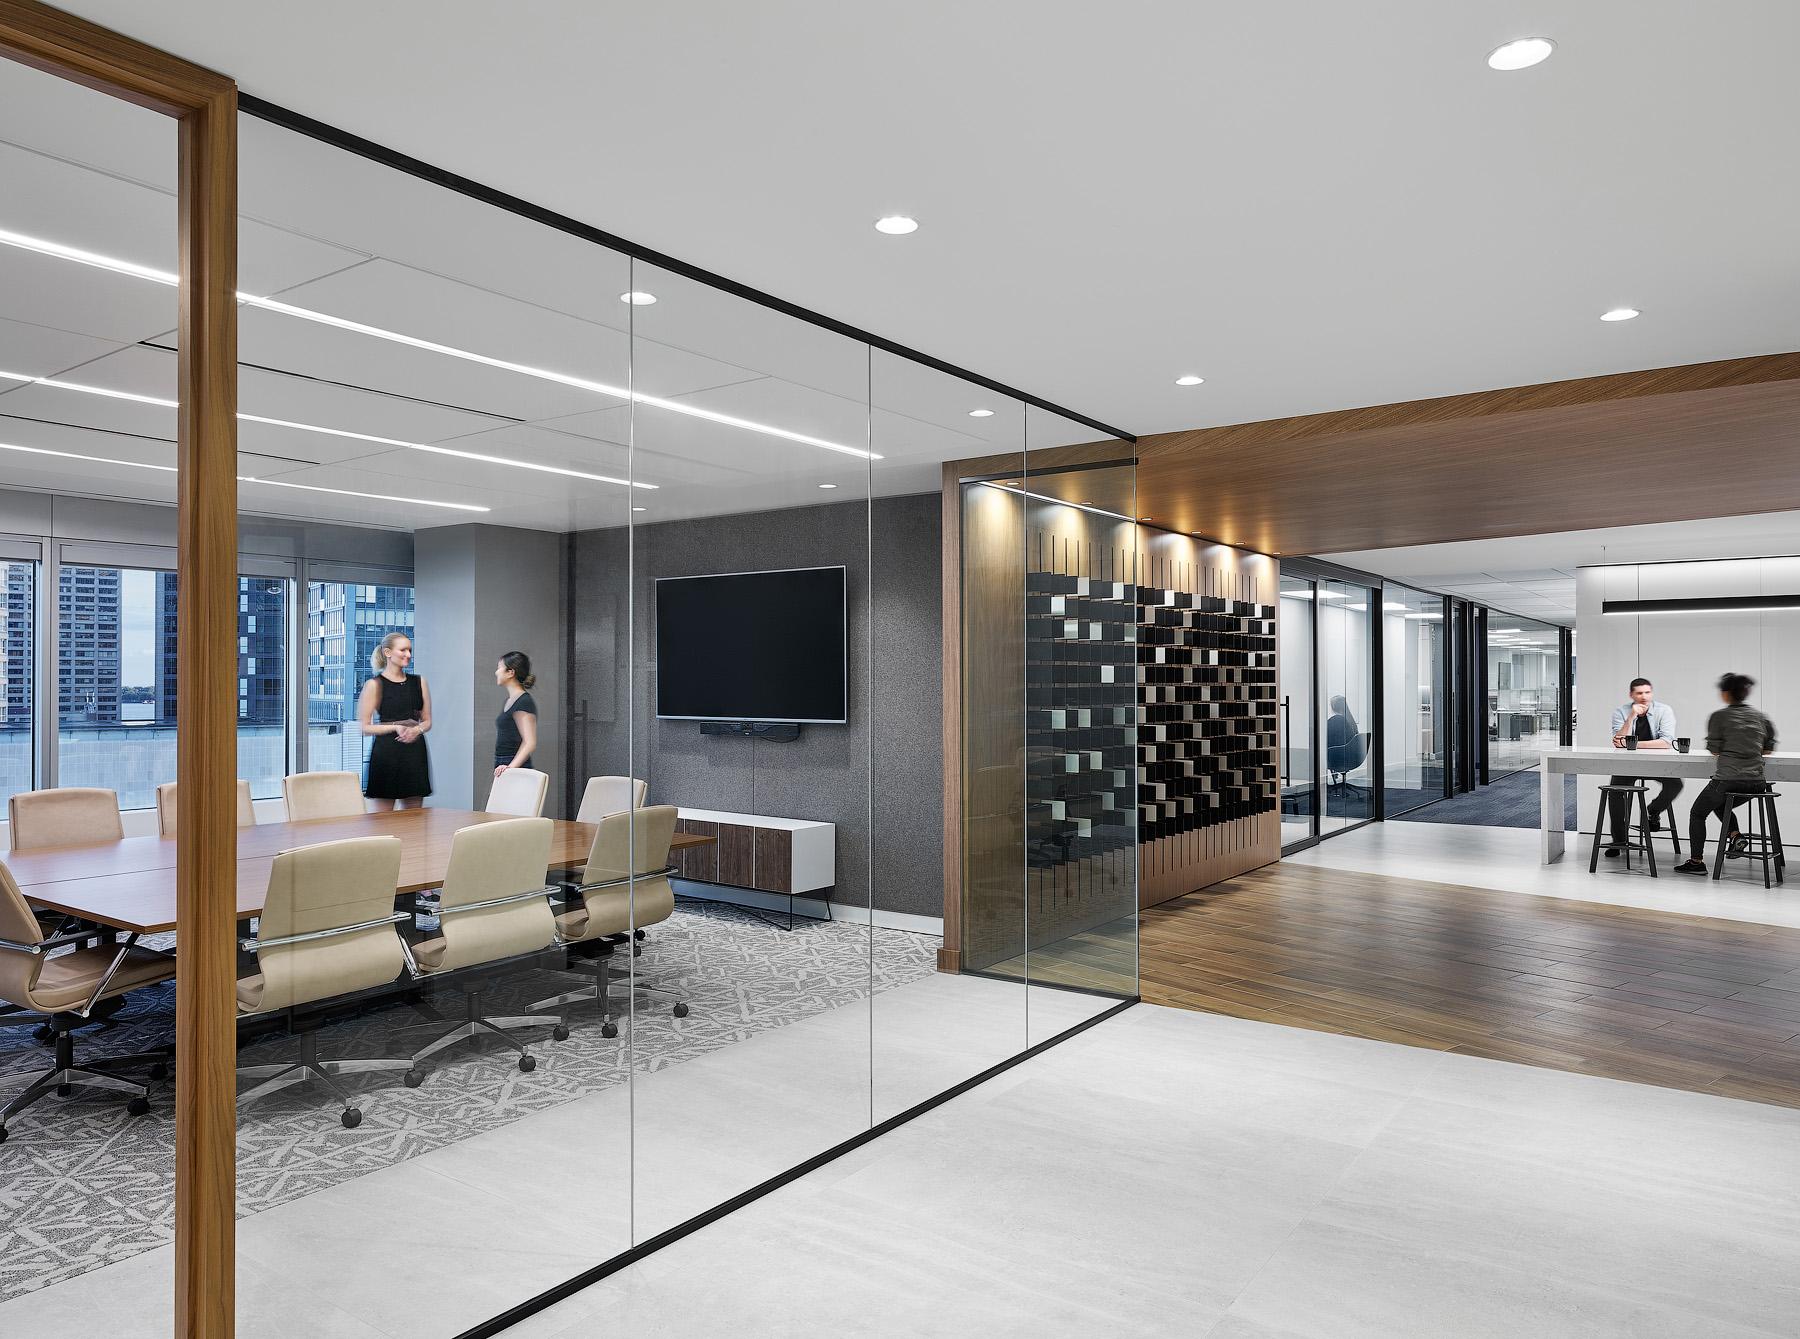 Optimus Toronto meeting room with glass walls, black metal trim, and wood paneling